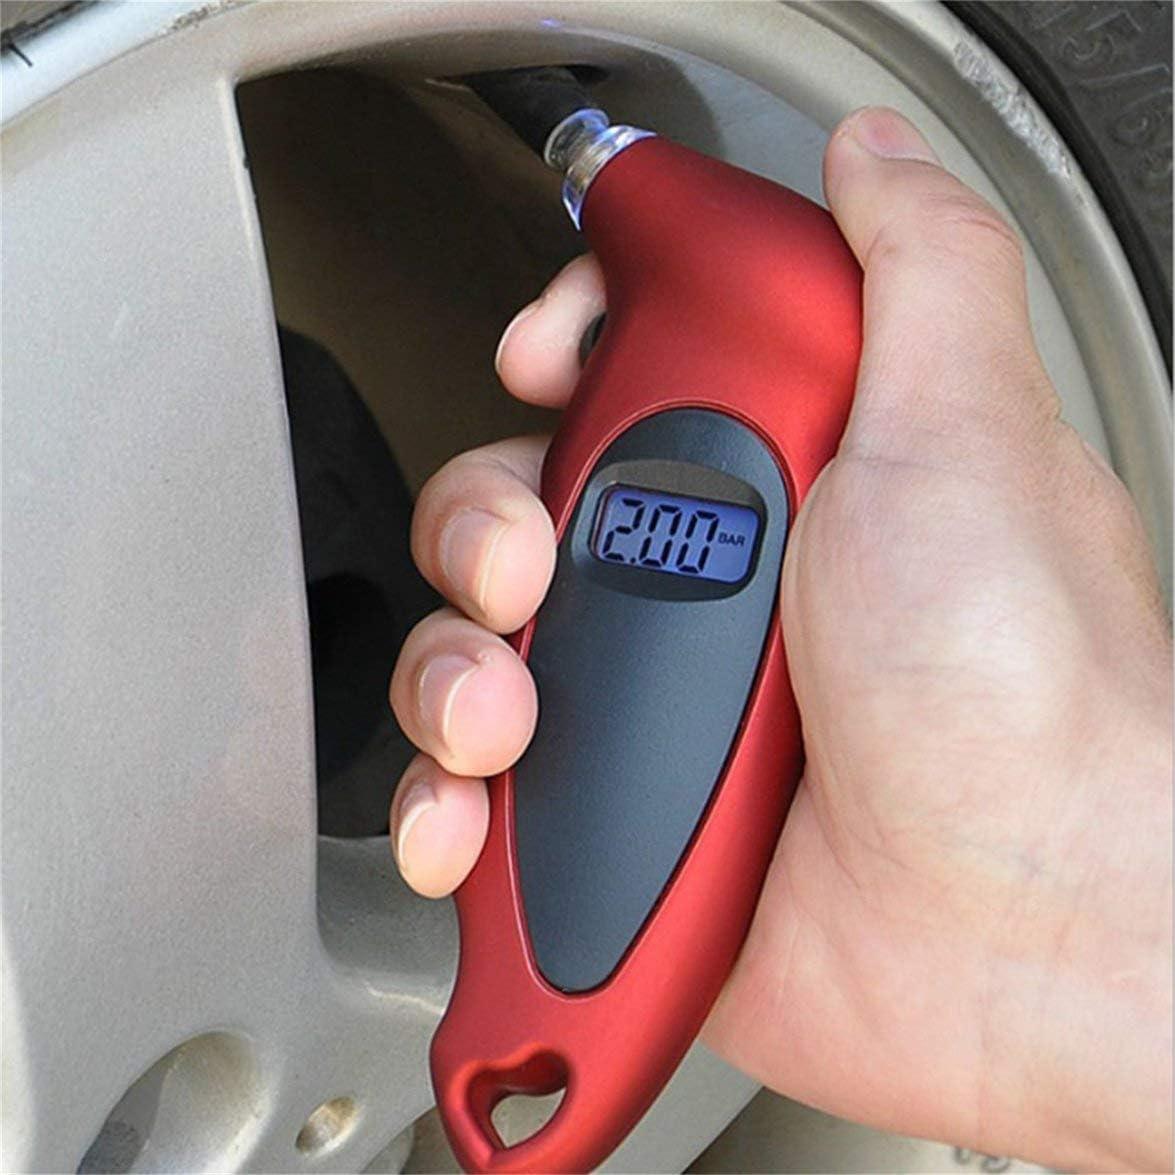 Monllack Professionelle LCD Display Auto Auto Motorrad Digitale Reifen Luftdruckmesser Manometer Tester Tool Reifen Manometer